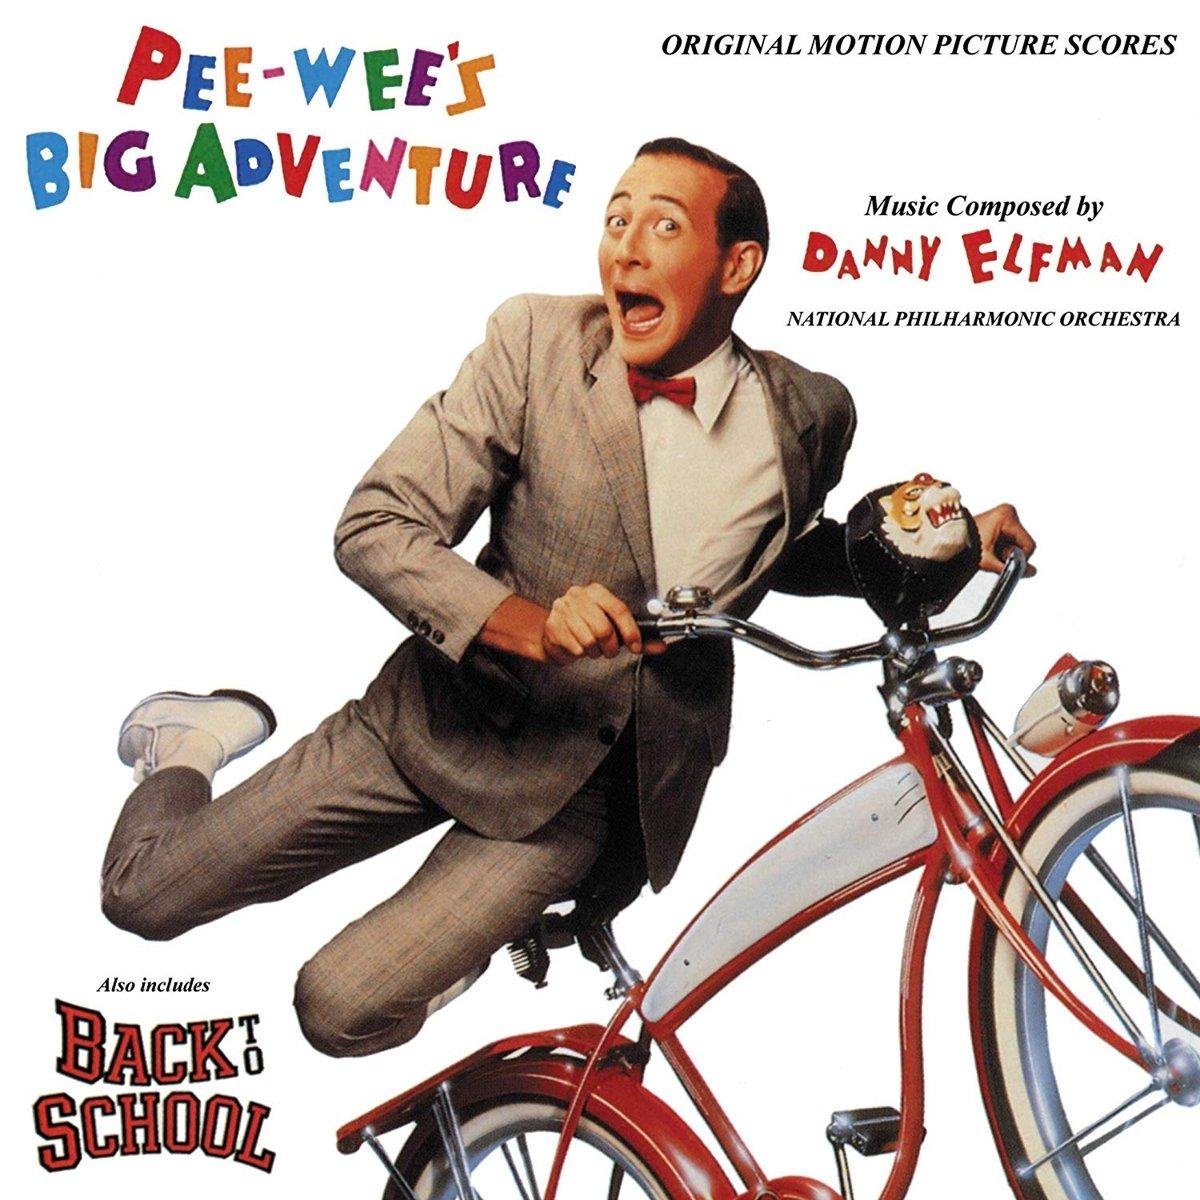 Danny Elfman Breakfast with Danny Elfman Sends Pee wees Big Adventure Racing